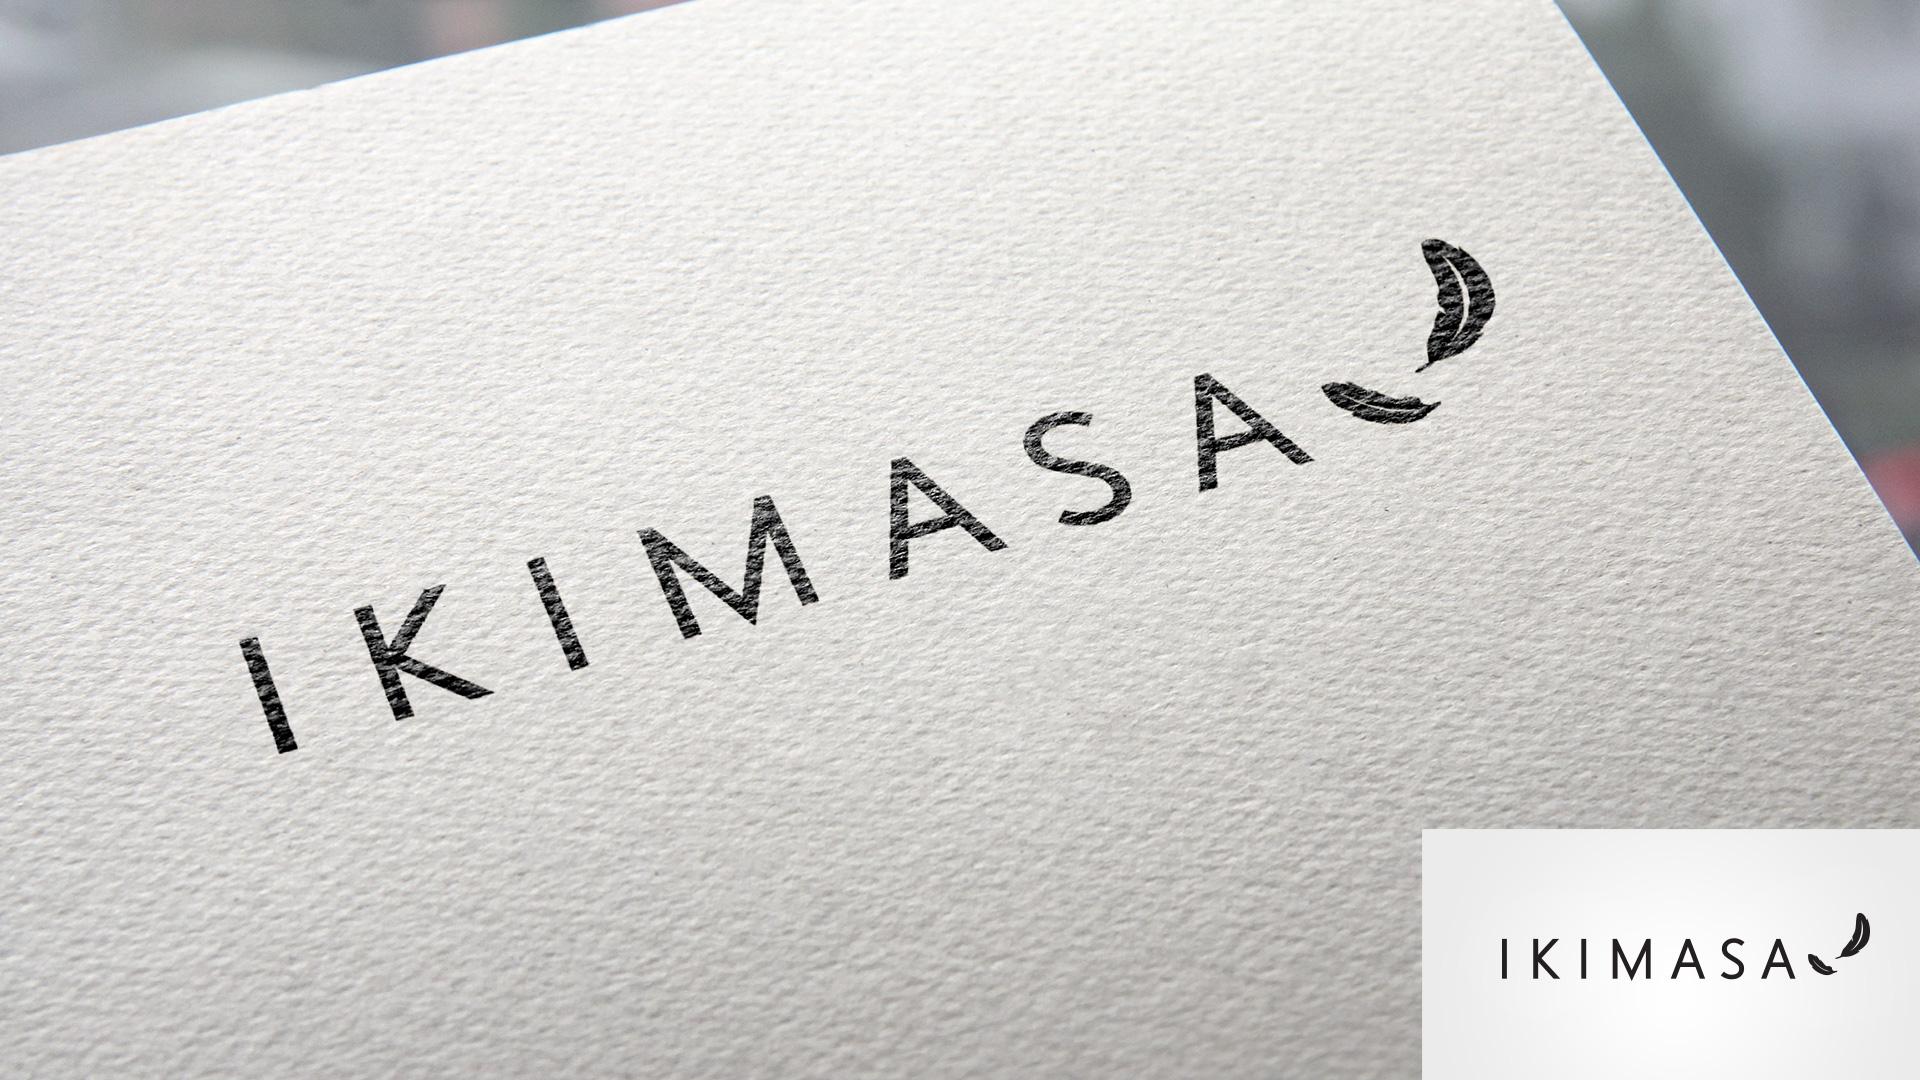 ikimasa-logo-3